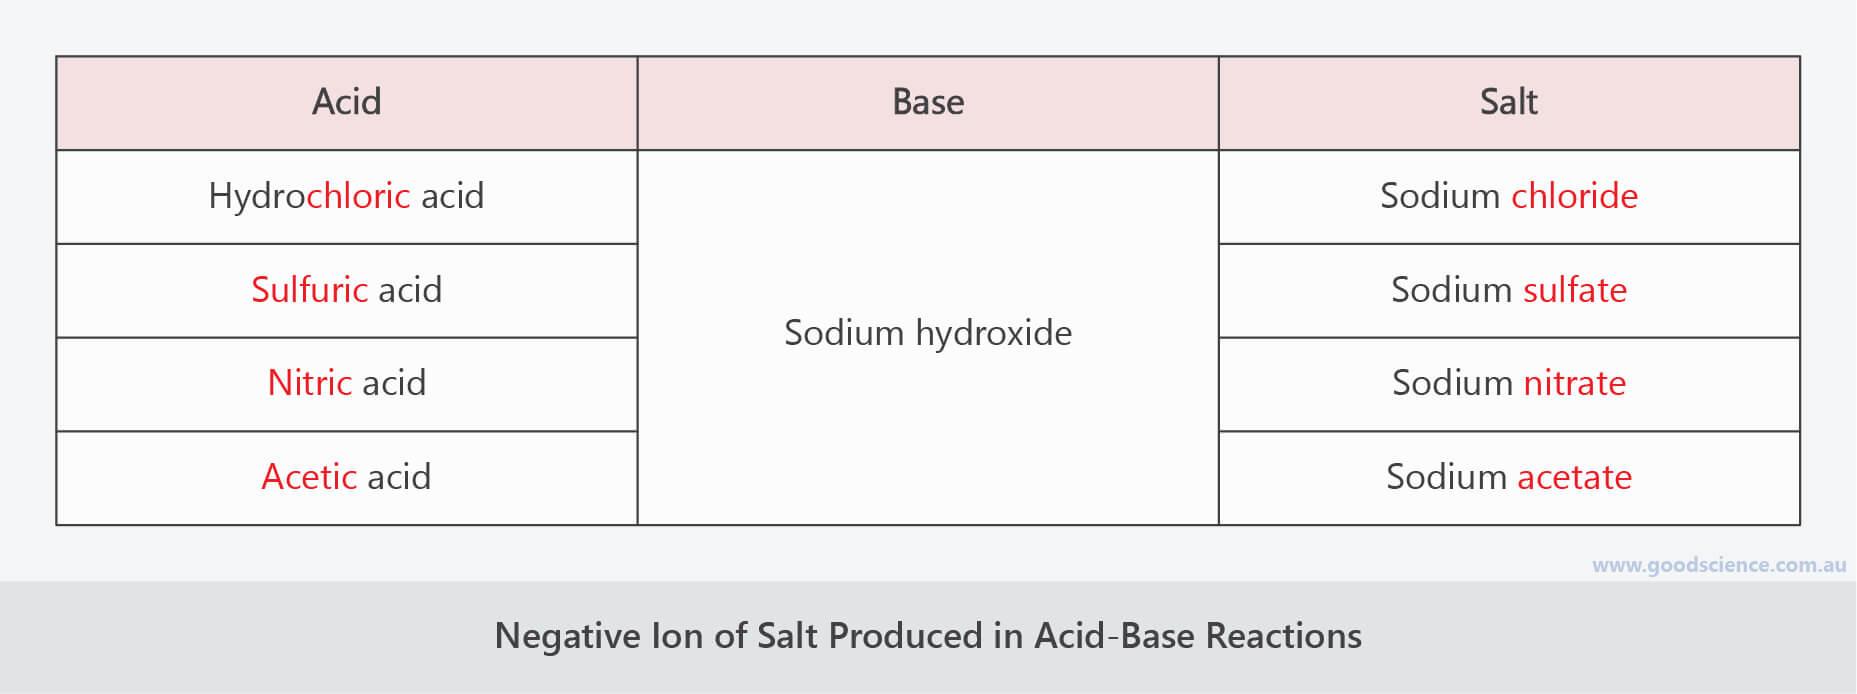 acid base neutralisation reaction salt negative ion